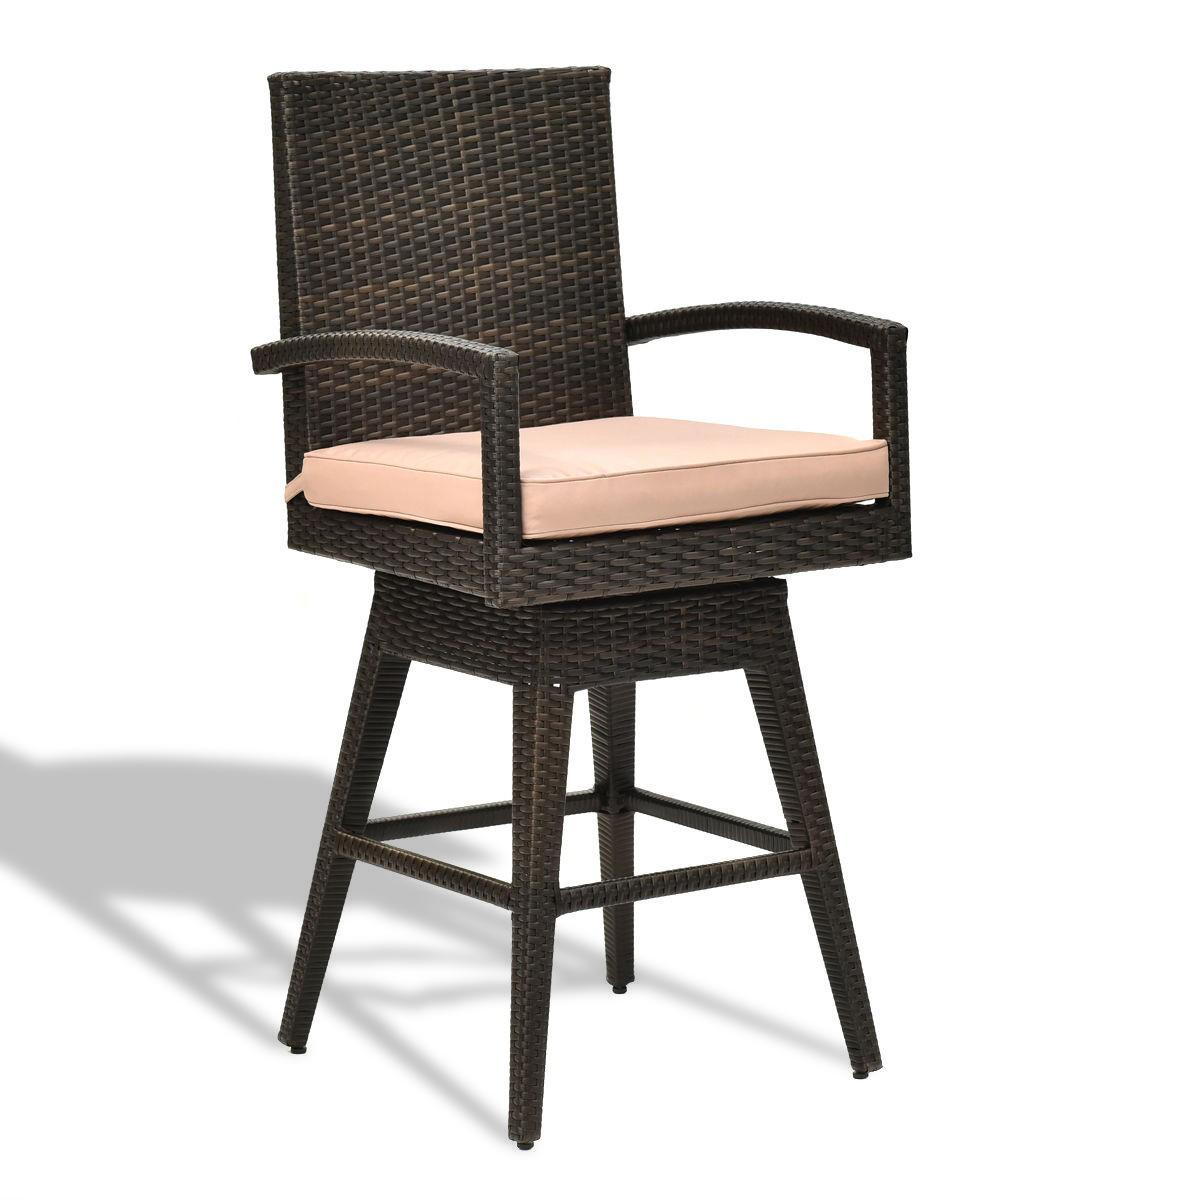 Outdoor Wicker Swivel Bar Stool Chair w/ Seat Cushion